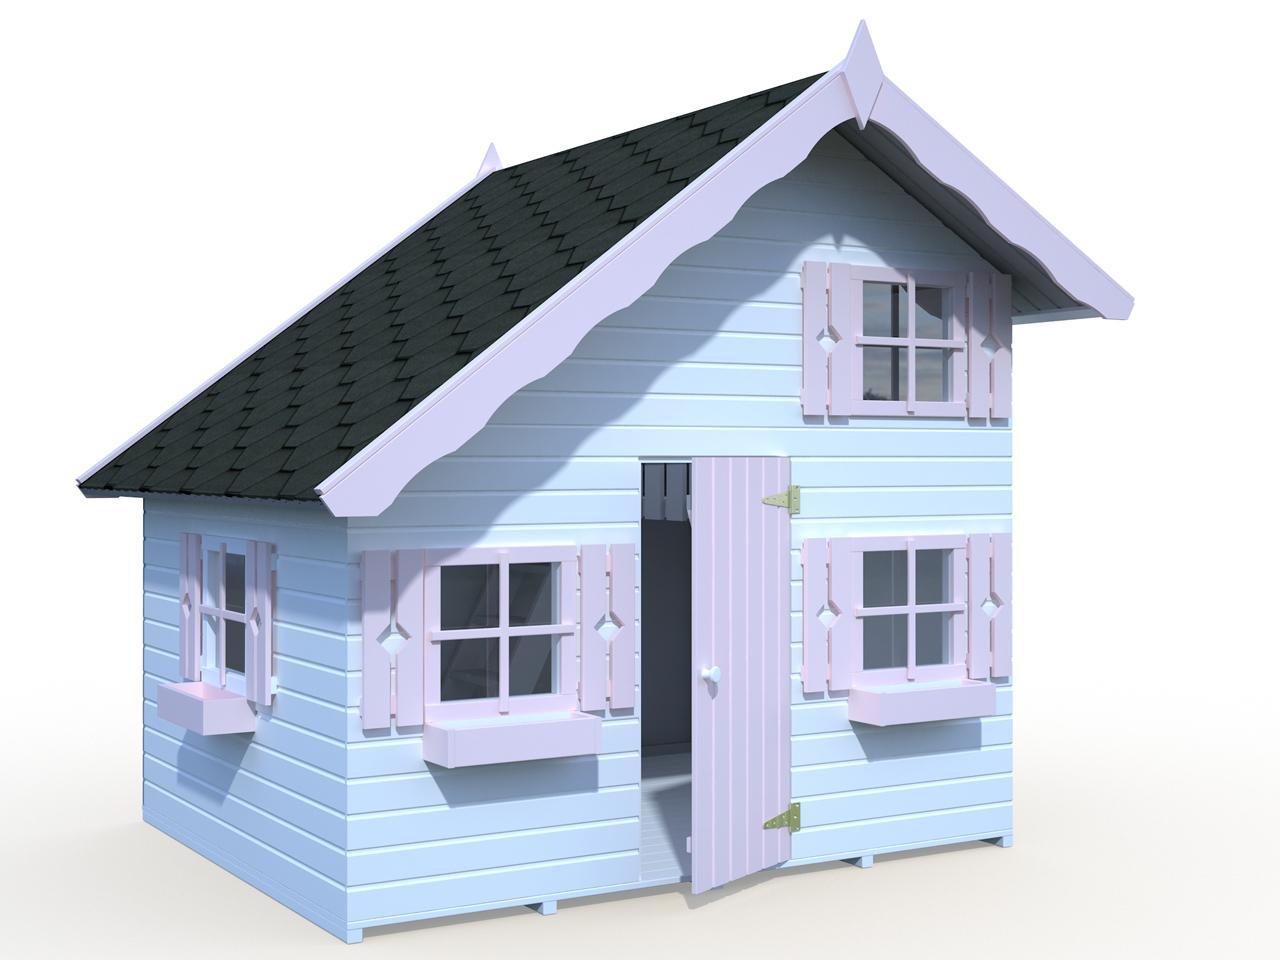 palmako kinderspielhaus tom 3 8 m gartenhaus. Black Bedroom Furniture Sets. Home Design Ideas